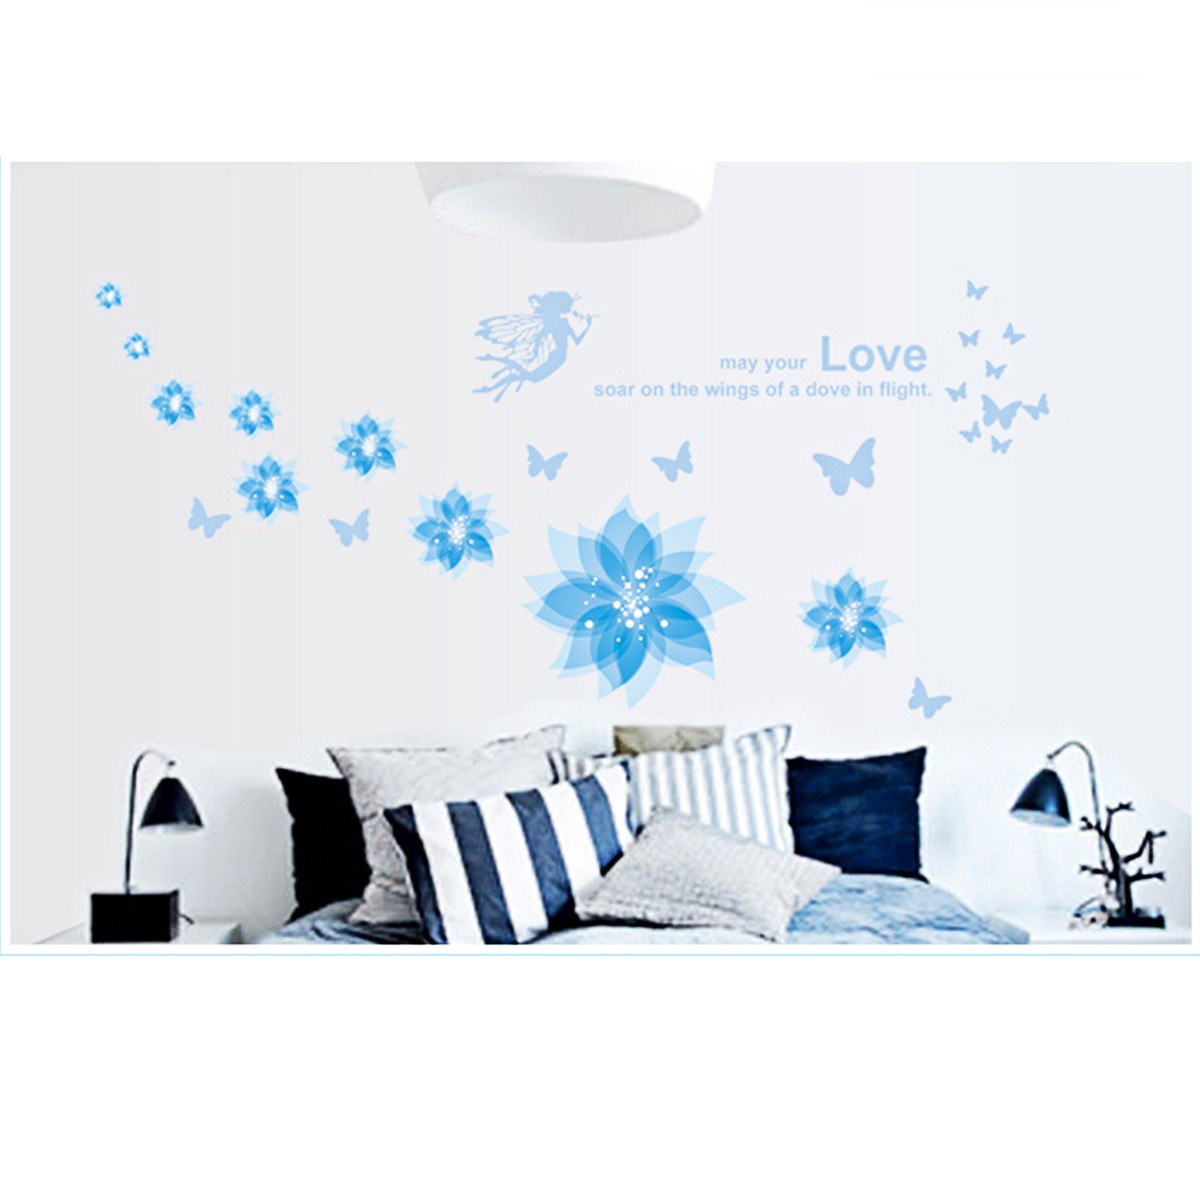 Blue Flowers Elf-C Removable Wall Art Sticker Mural Home